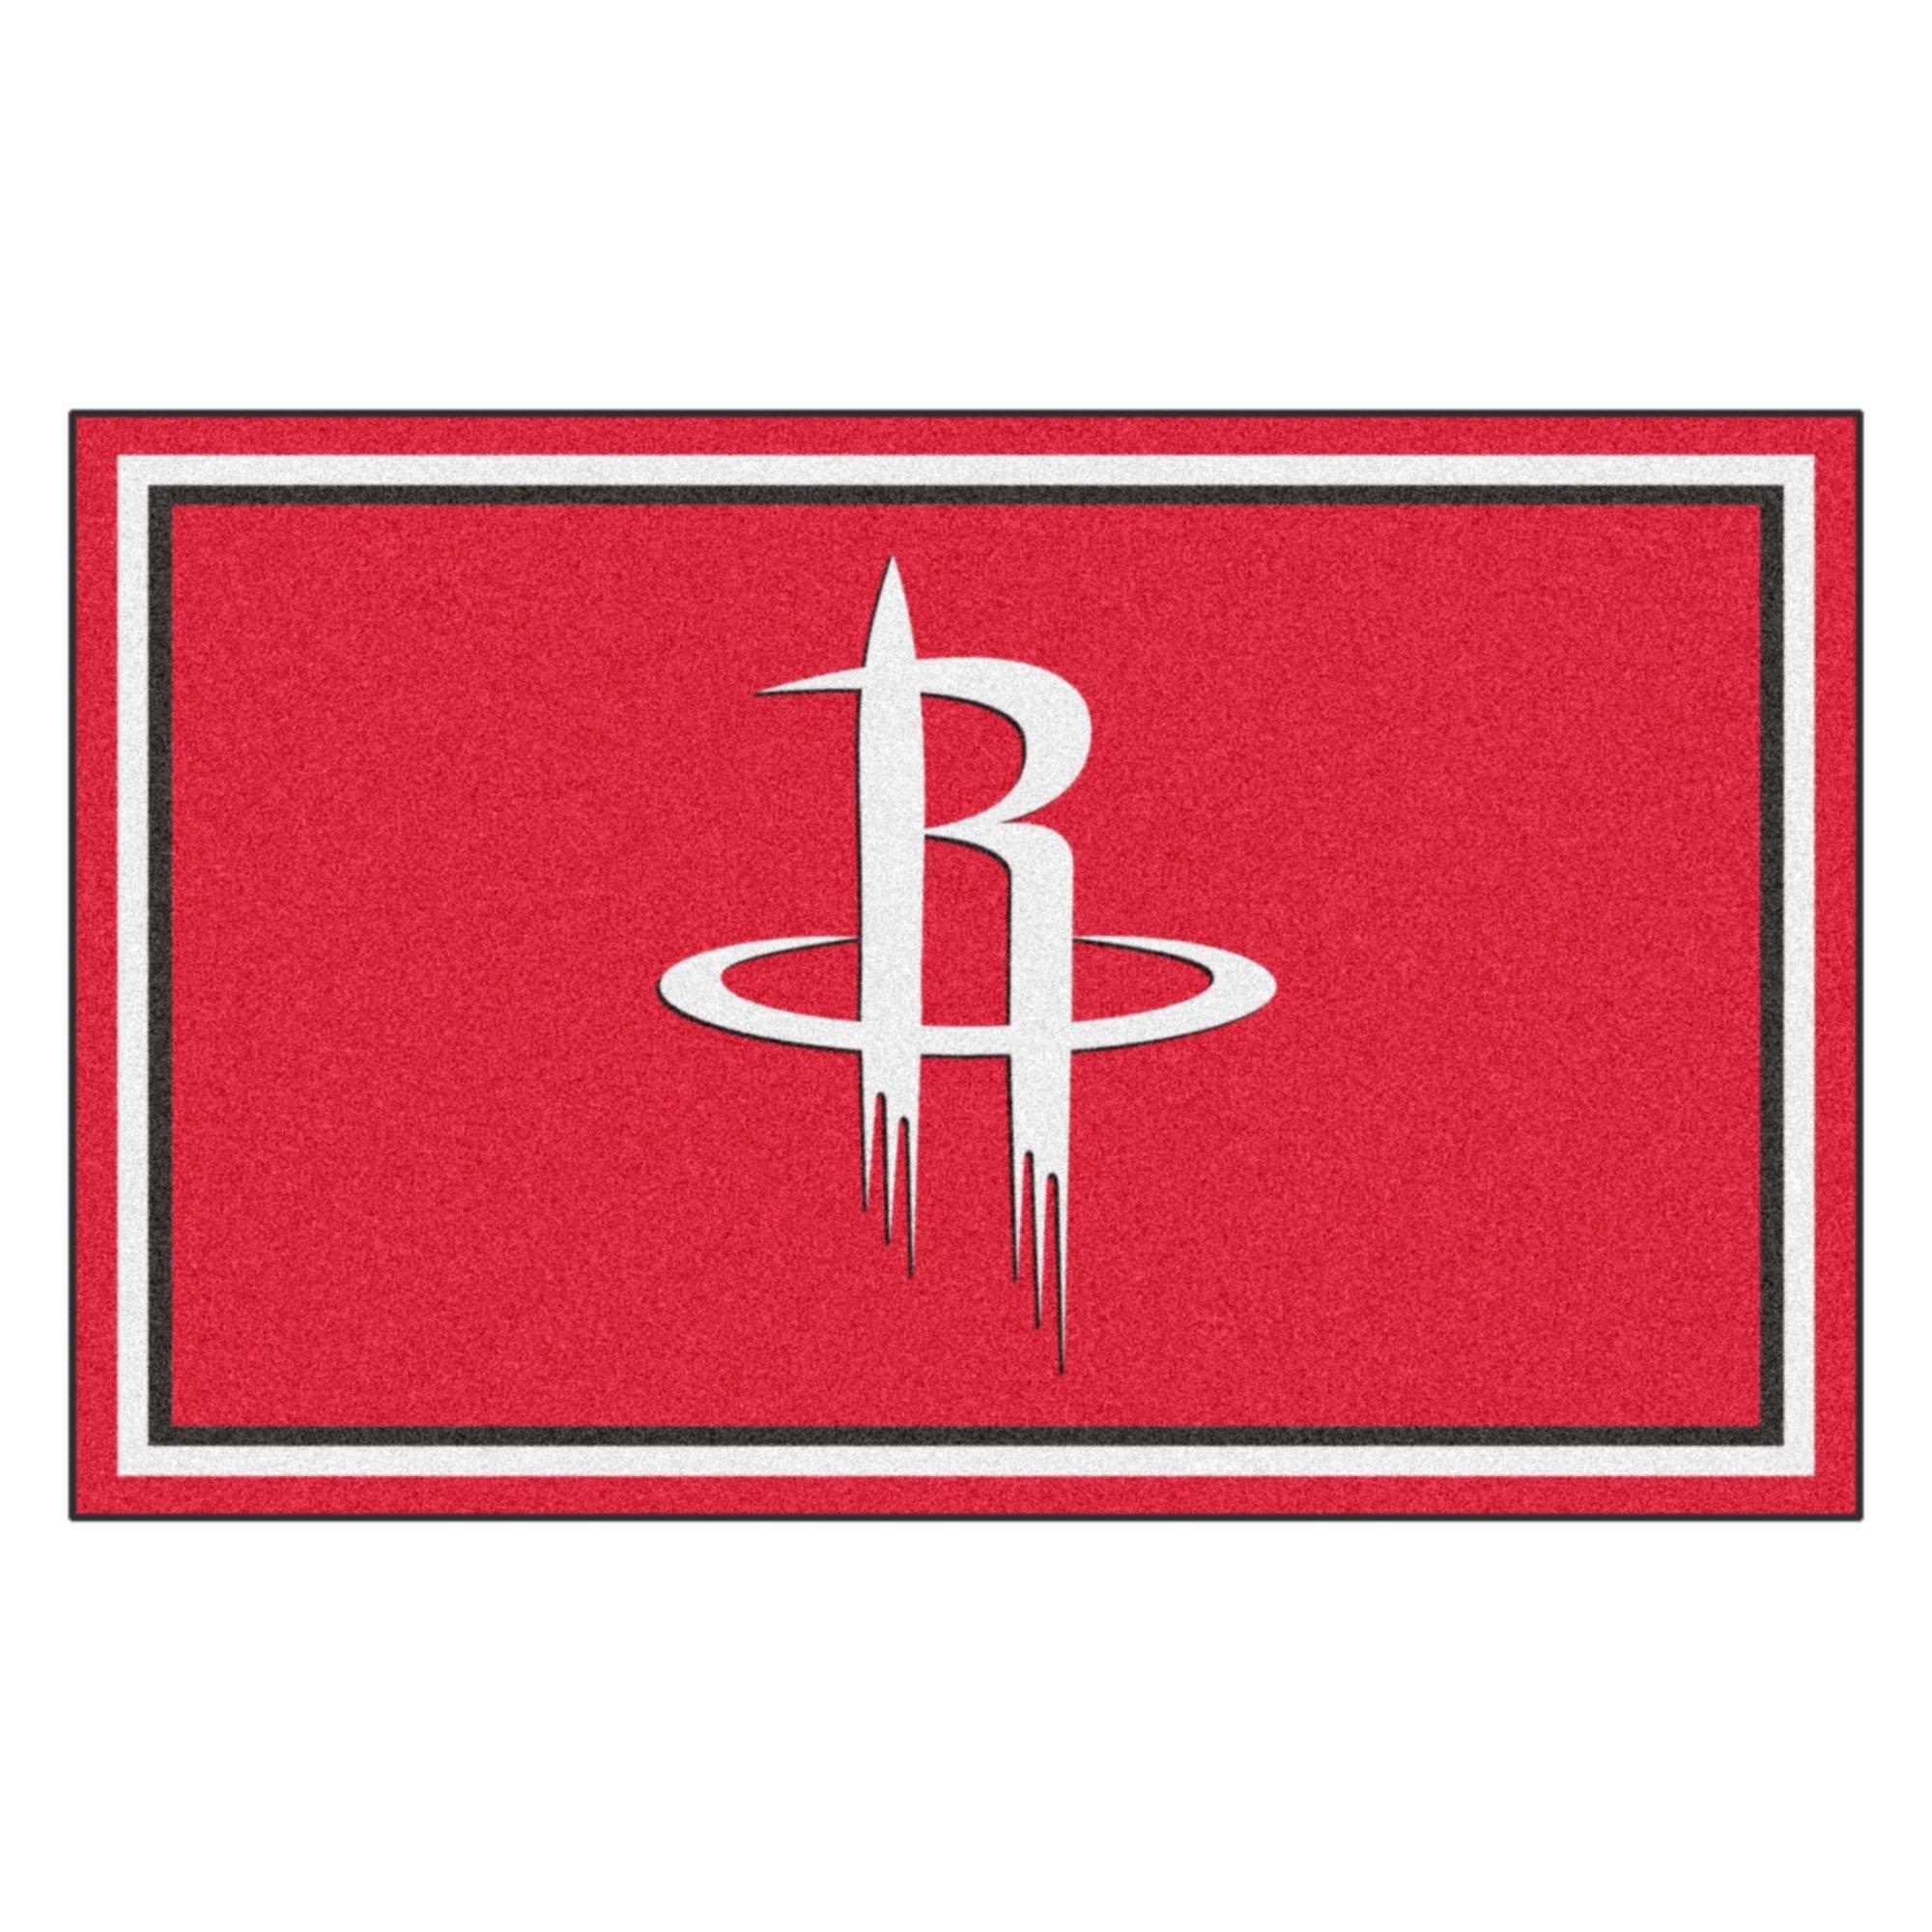 FANMATS 20428 NBA - Houston Rockets 4'X6' Rug, Team Color, 44''x71'' by Fanmats